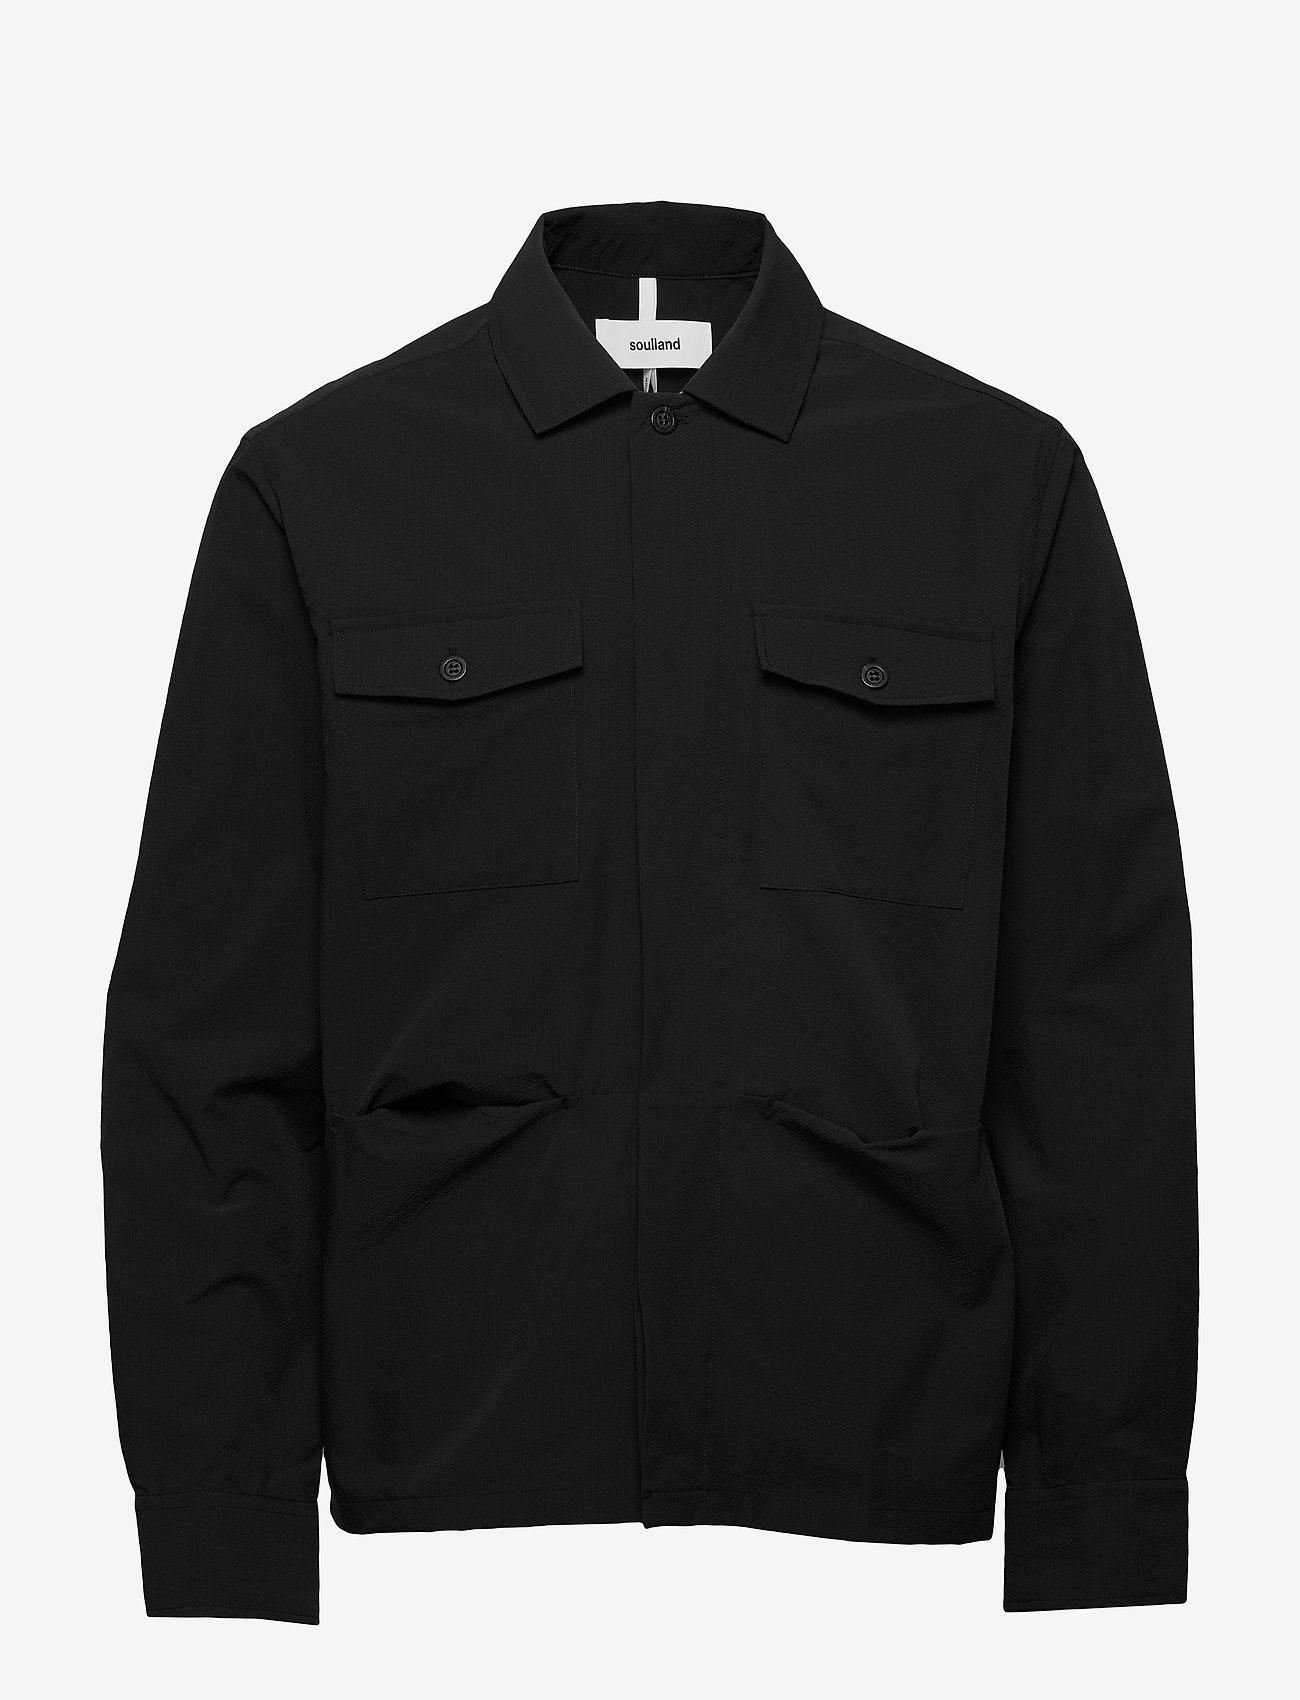 Soulland - Tag - overshirts - black - 0